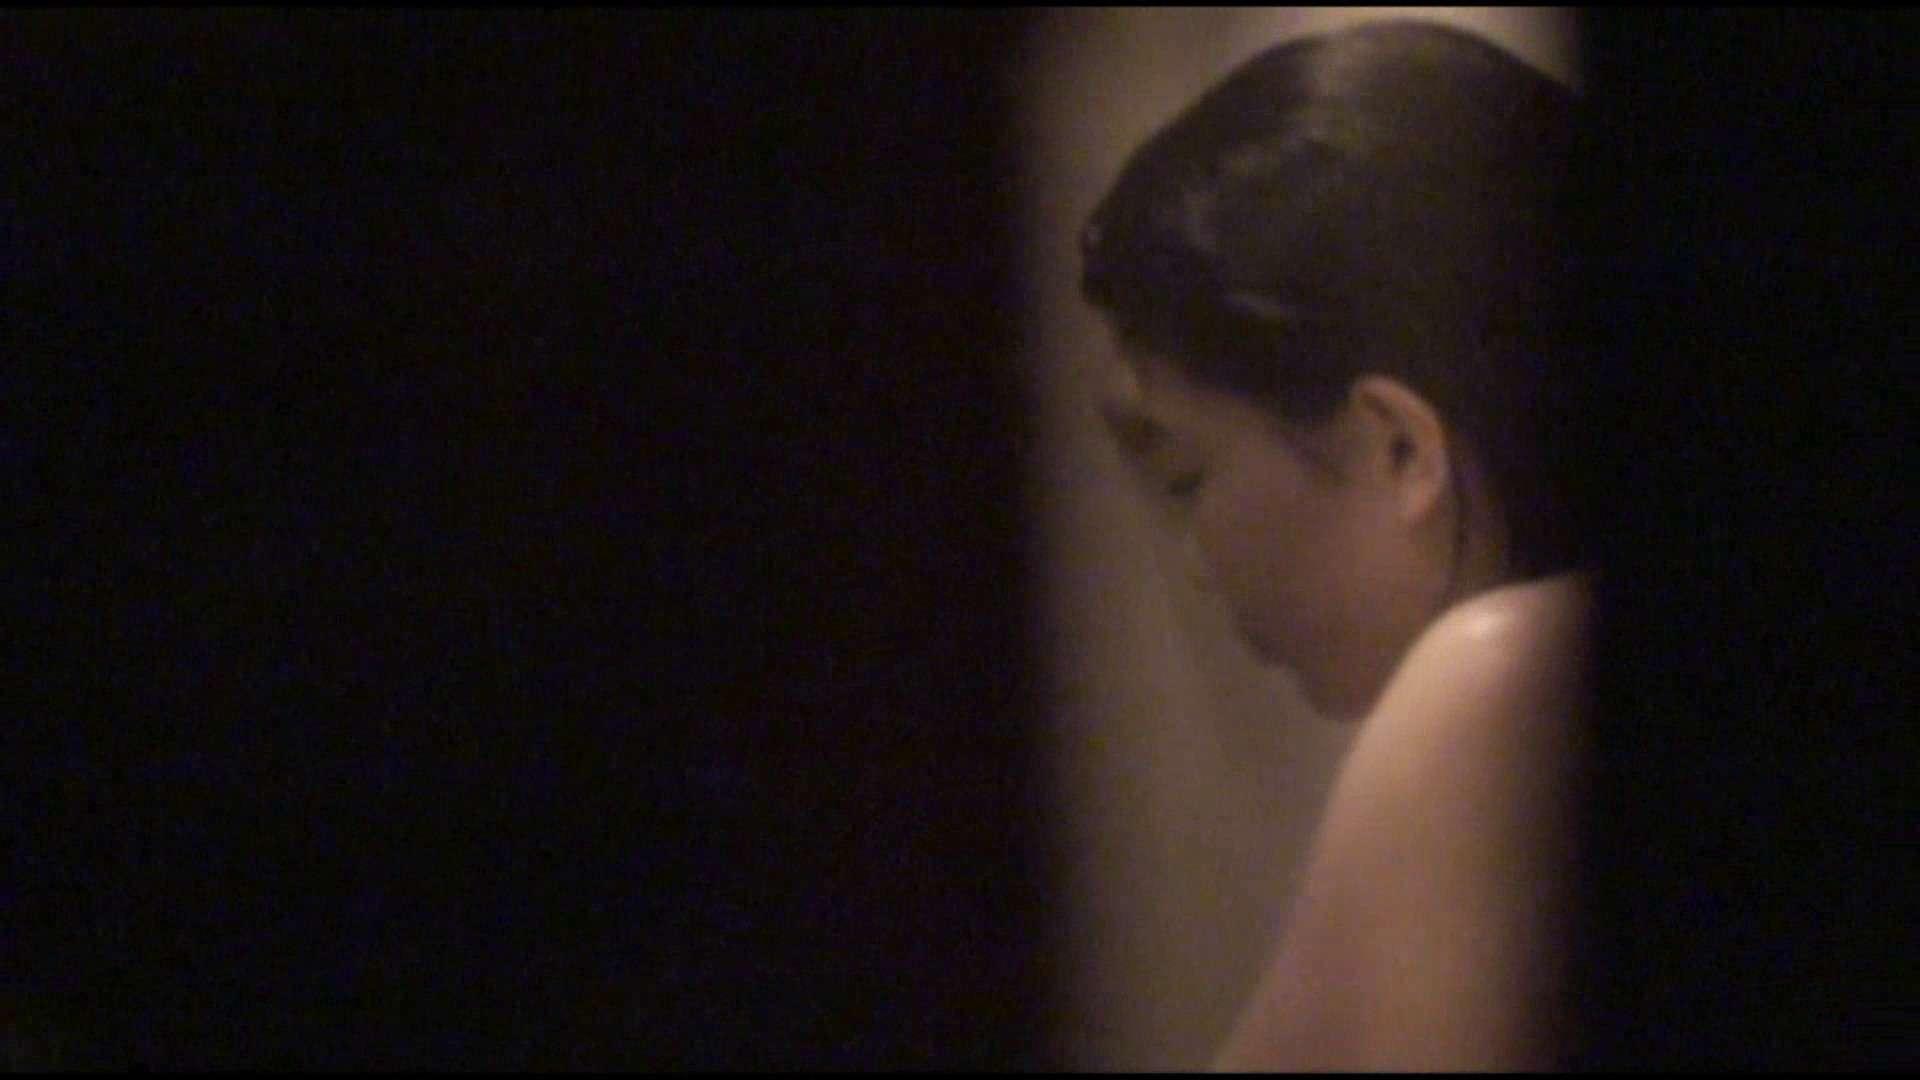 vol.05最高の極上美人!可愛い彼女の裸体をどうぞ!風呂上り鏡チェックも必見! 美人  68pic 40